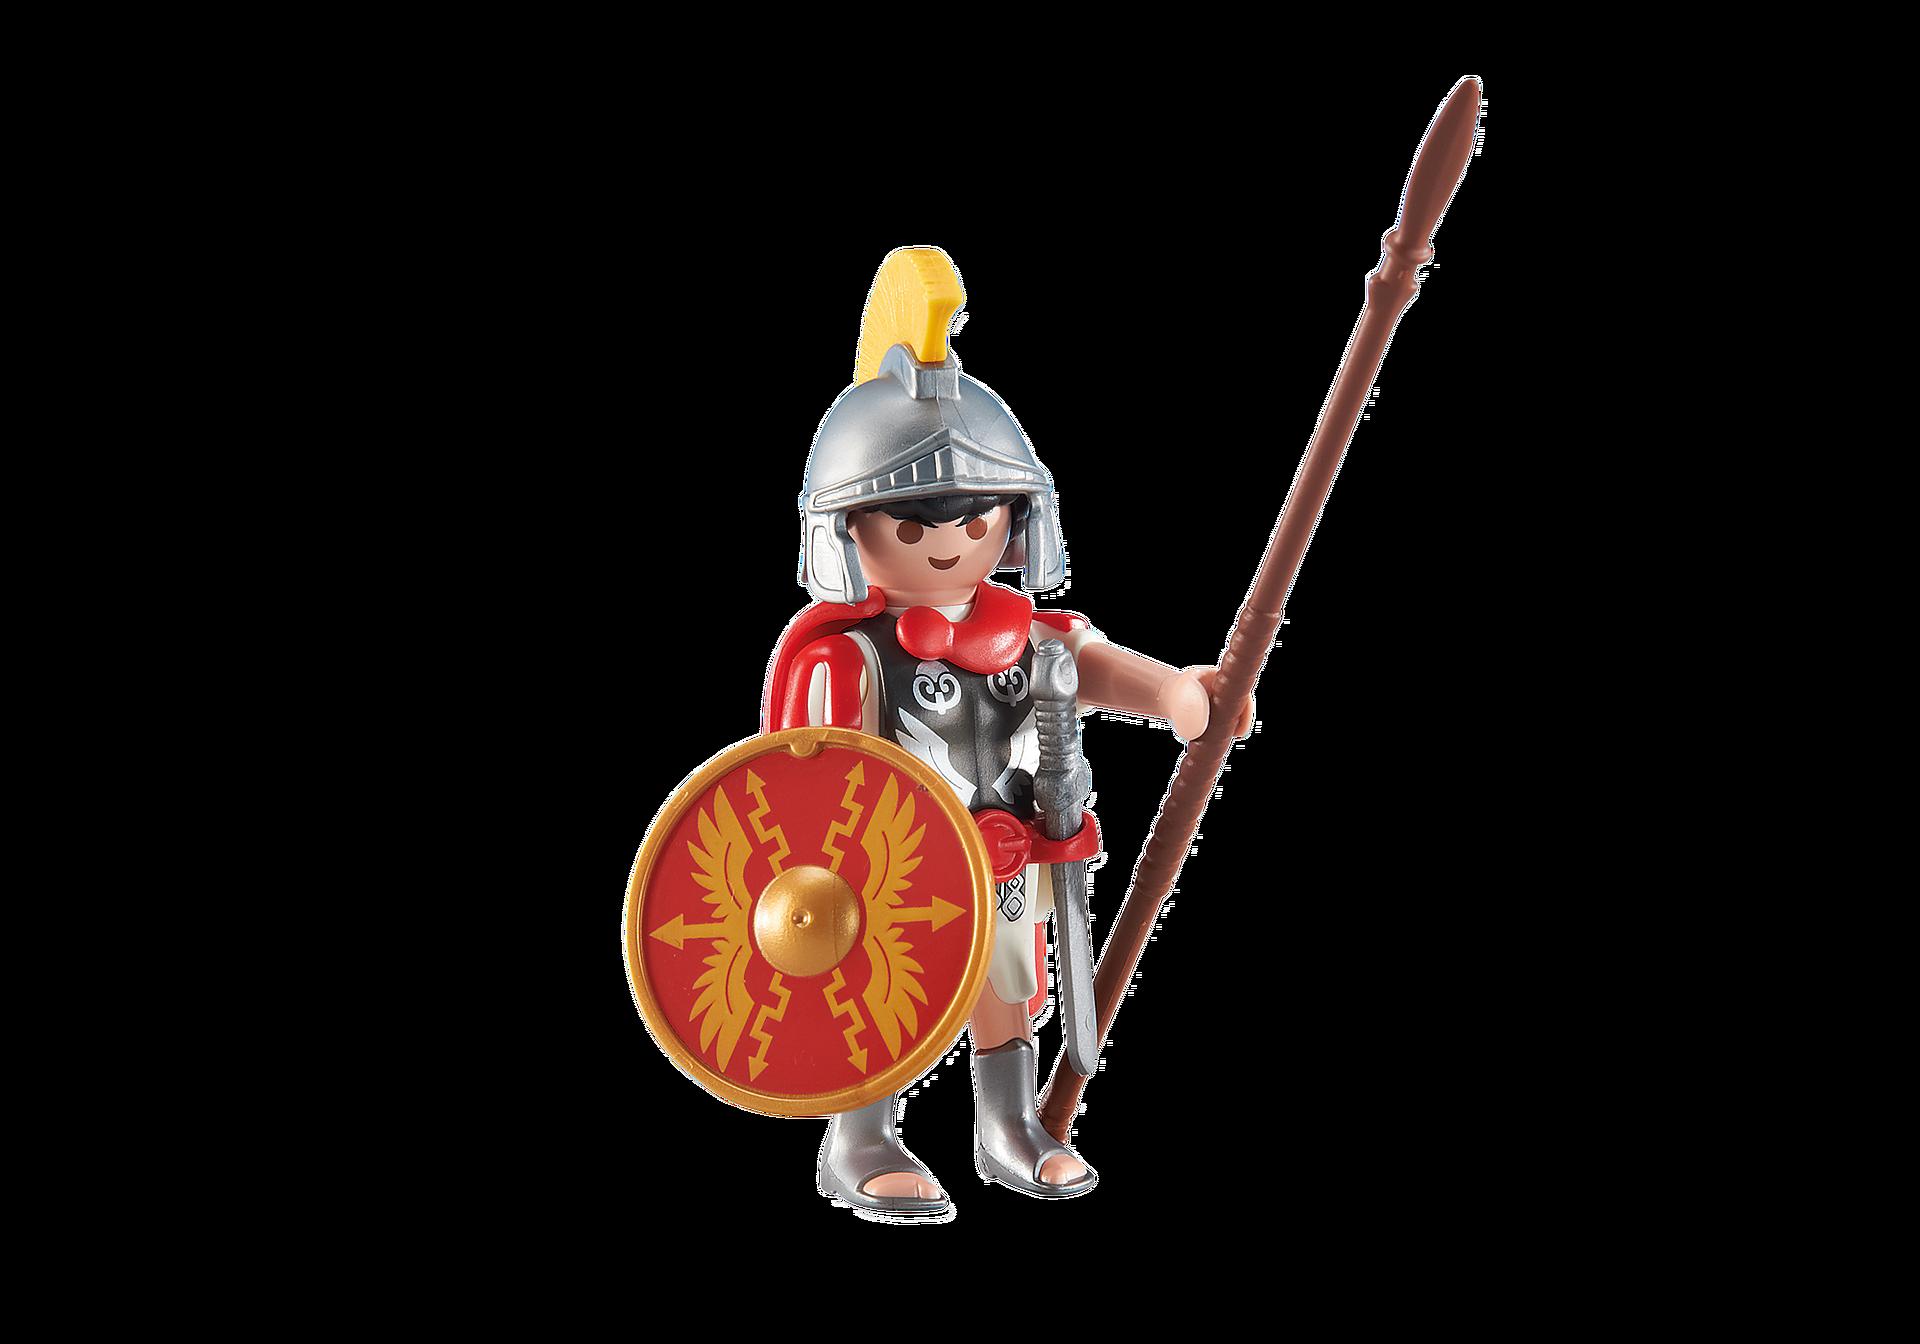 6491 Tribun romain zoom image1